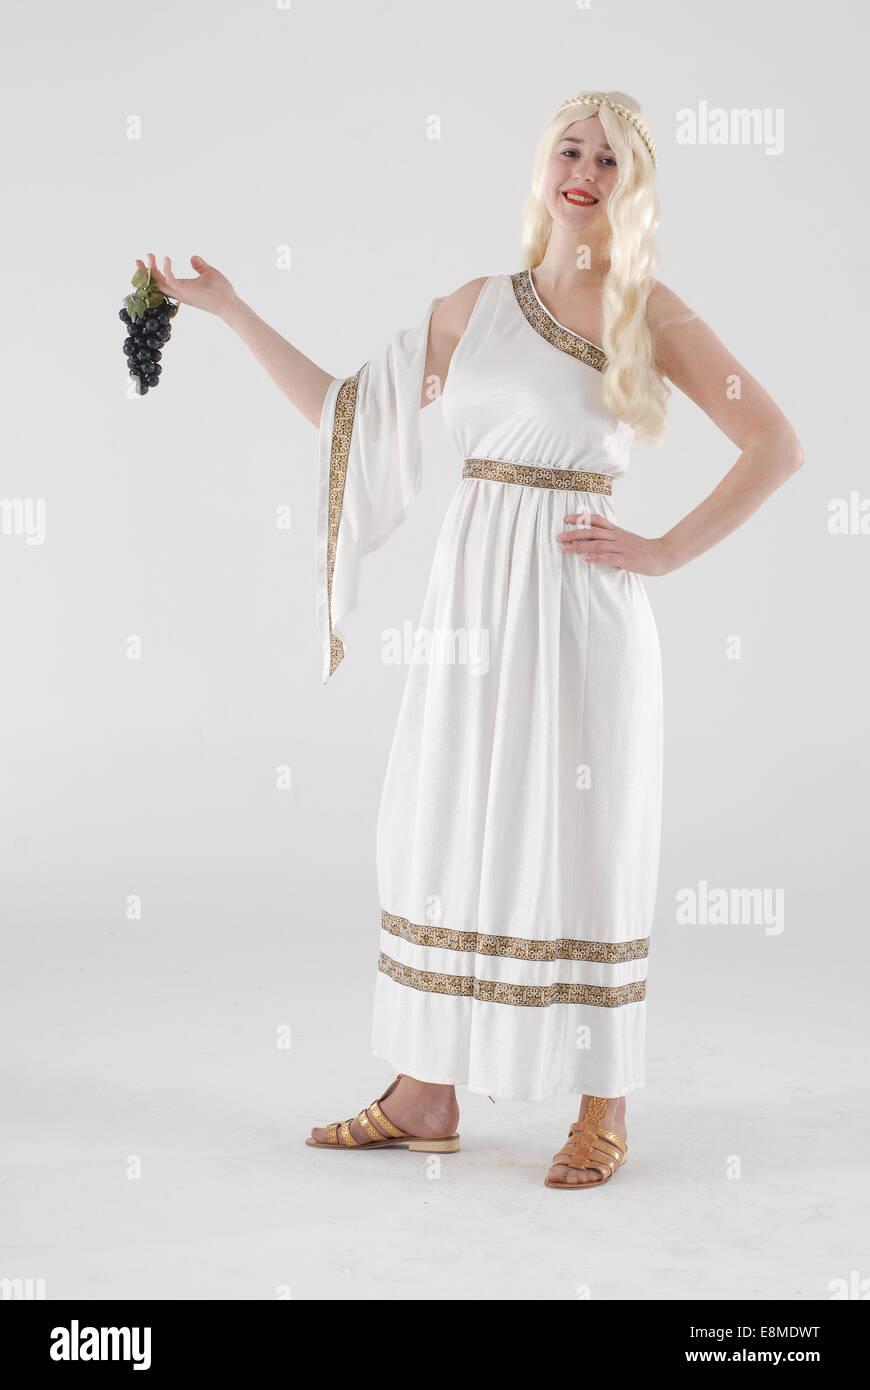 084ead66b girl dressed in fancy dress comedy costume as a roman   edyptian lady in a  white skirt